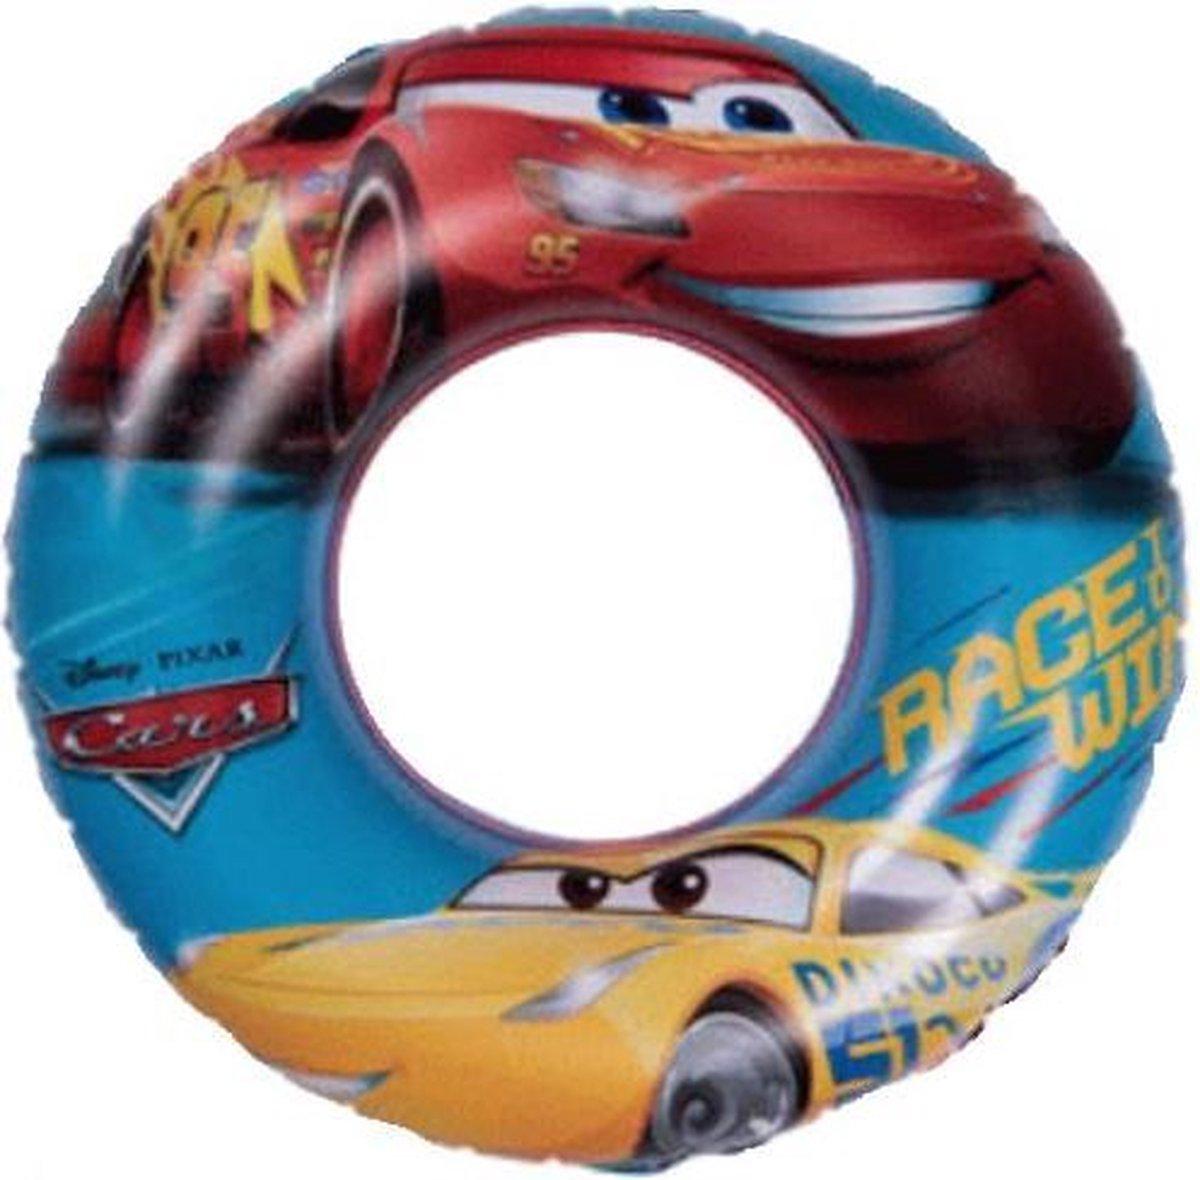 Cars zwemring - zwemband 51 cm